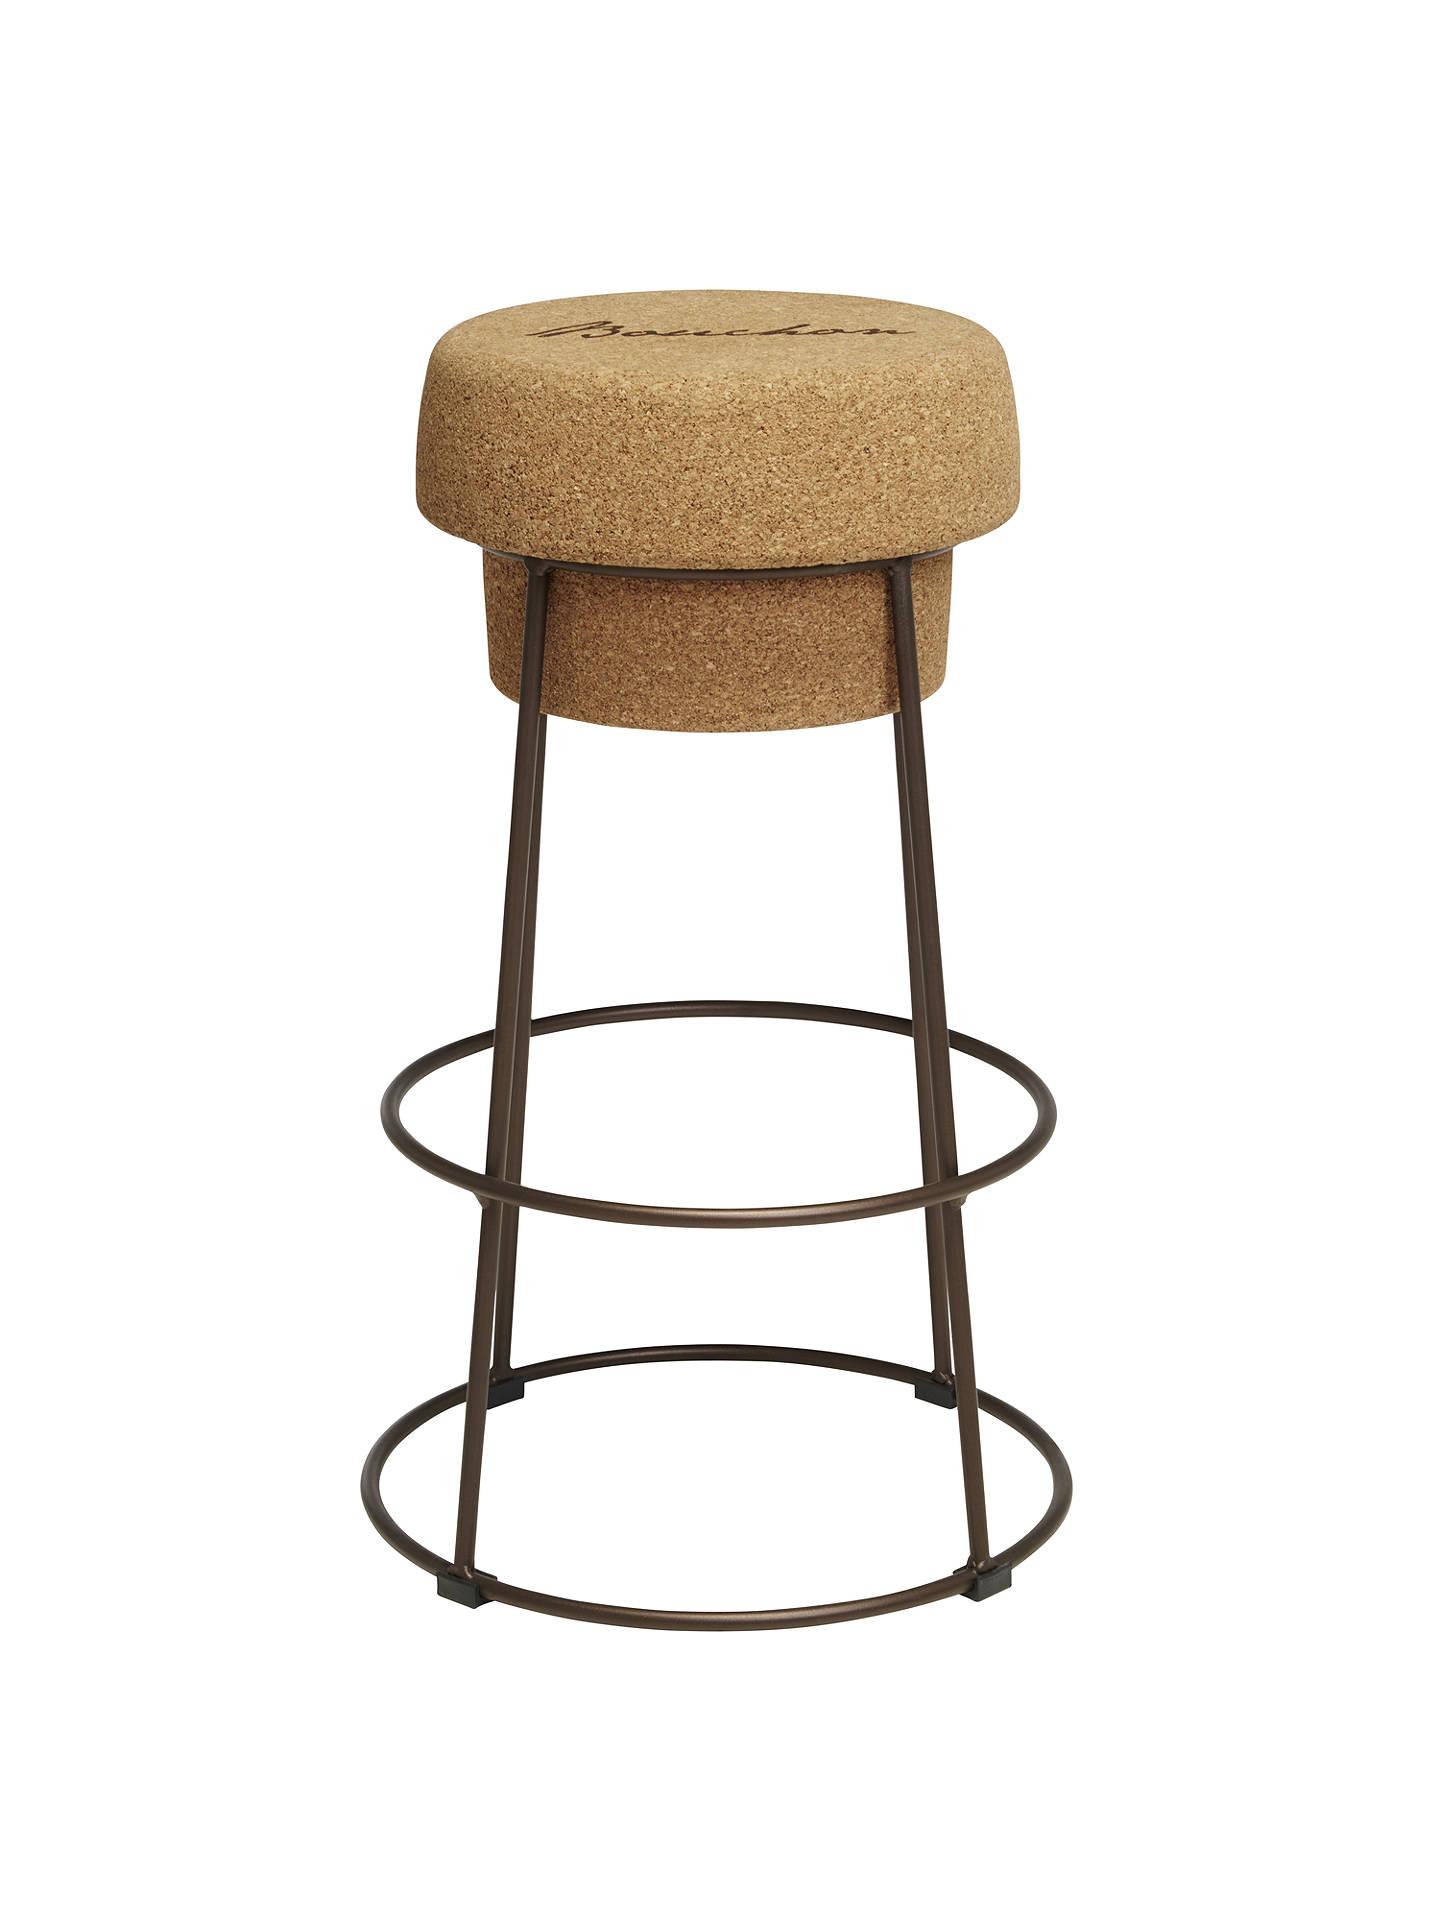 john lewis bouchon bar stool cork at john lewis partners. Black Bedroom Furniture Sets. Home Design Ideas